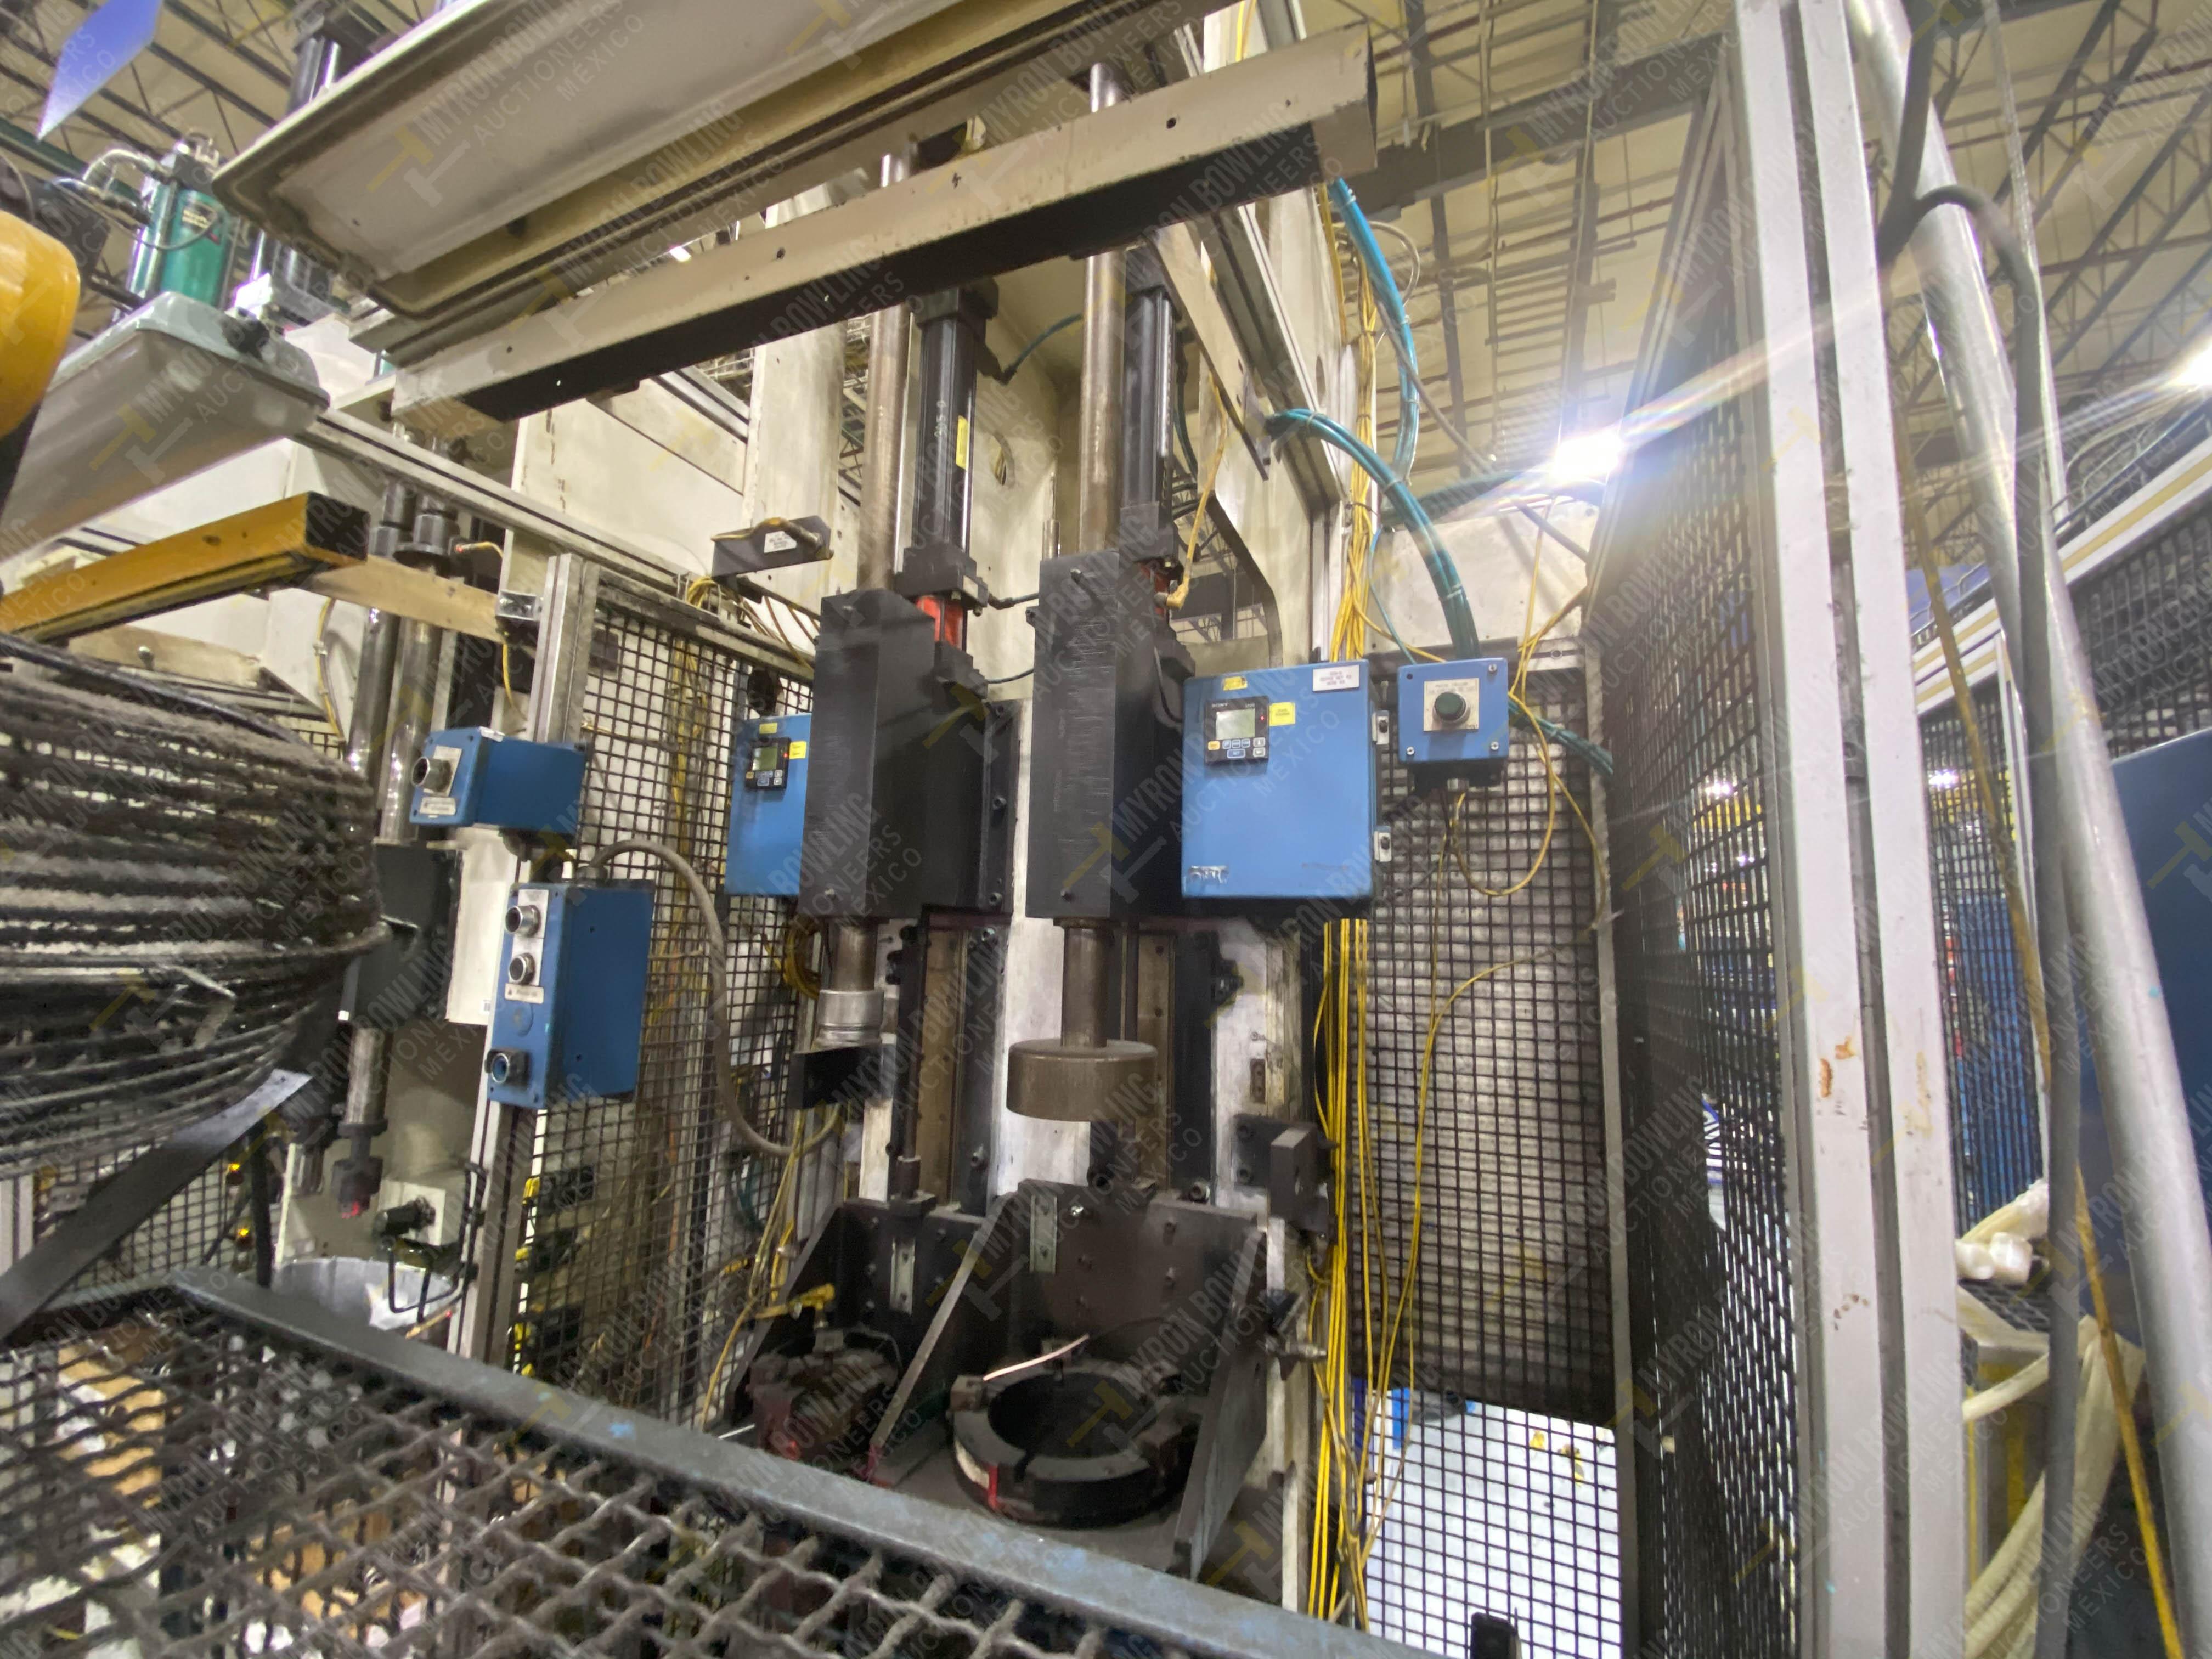 Estación semiautomática para operación 305D, contiene: Prensa tipo cuello de ganso con dos cilindros